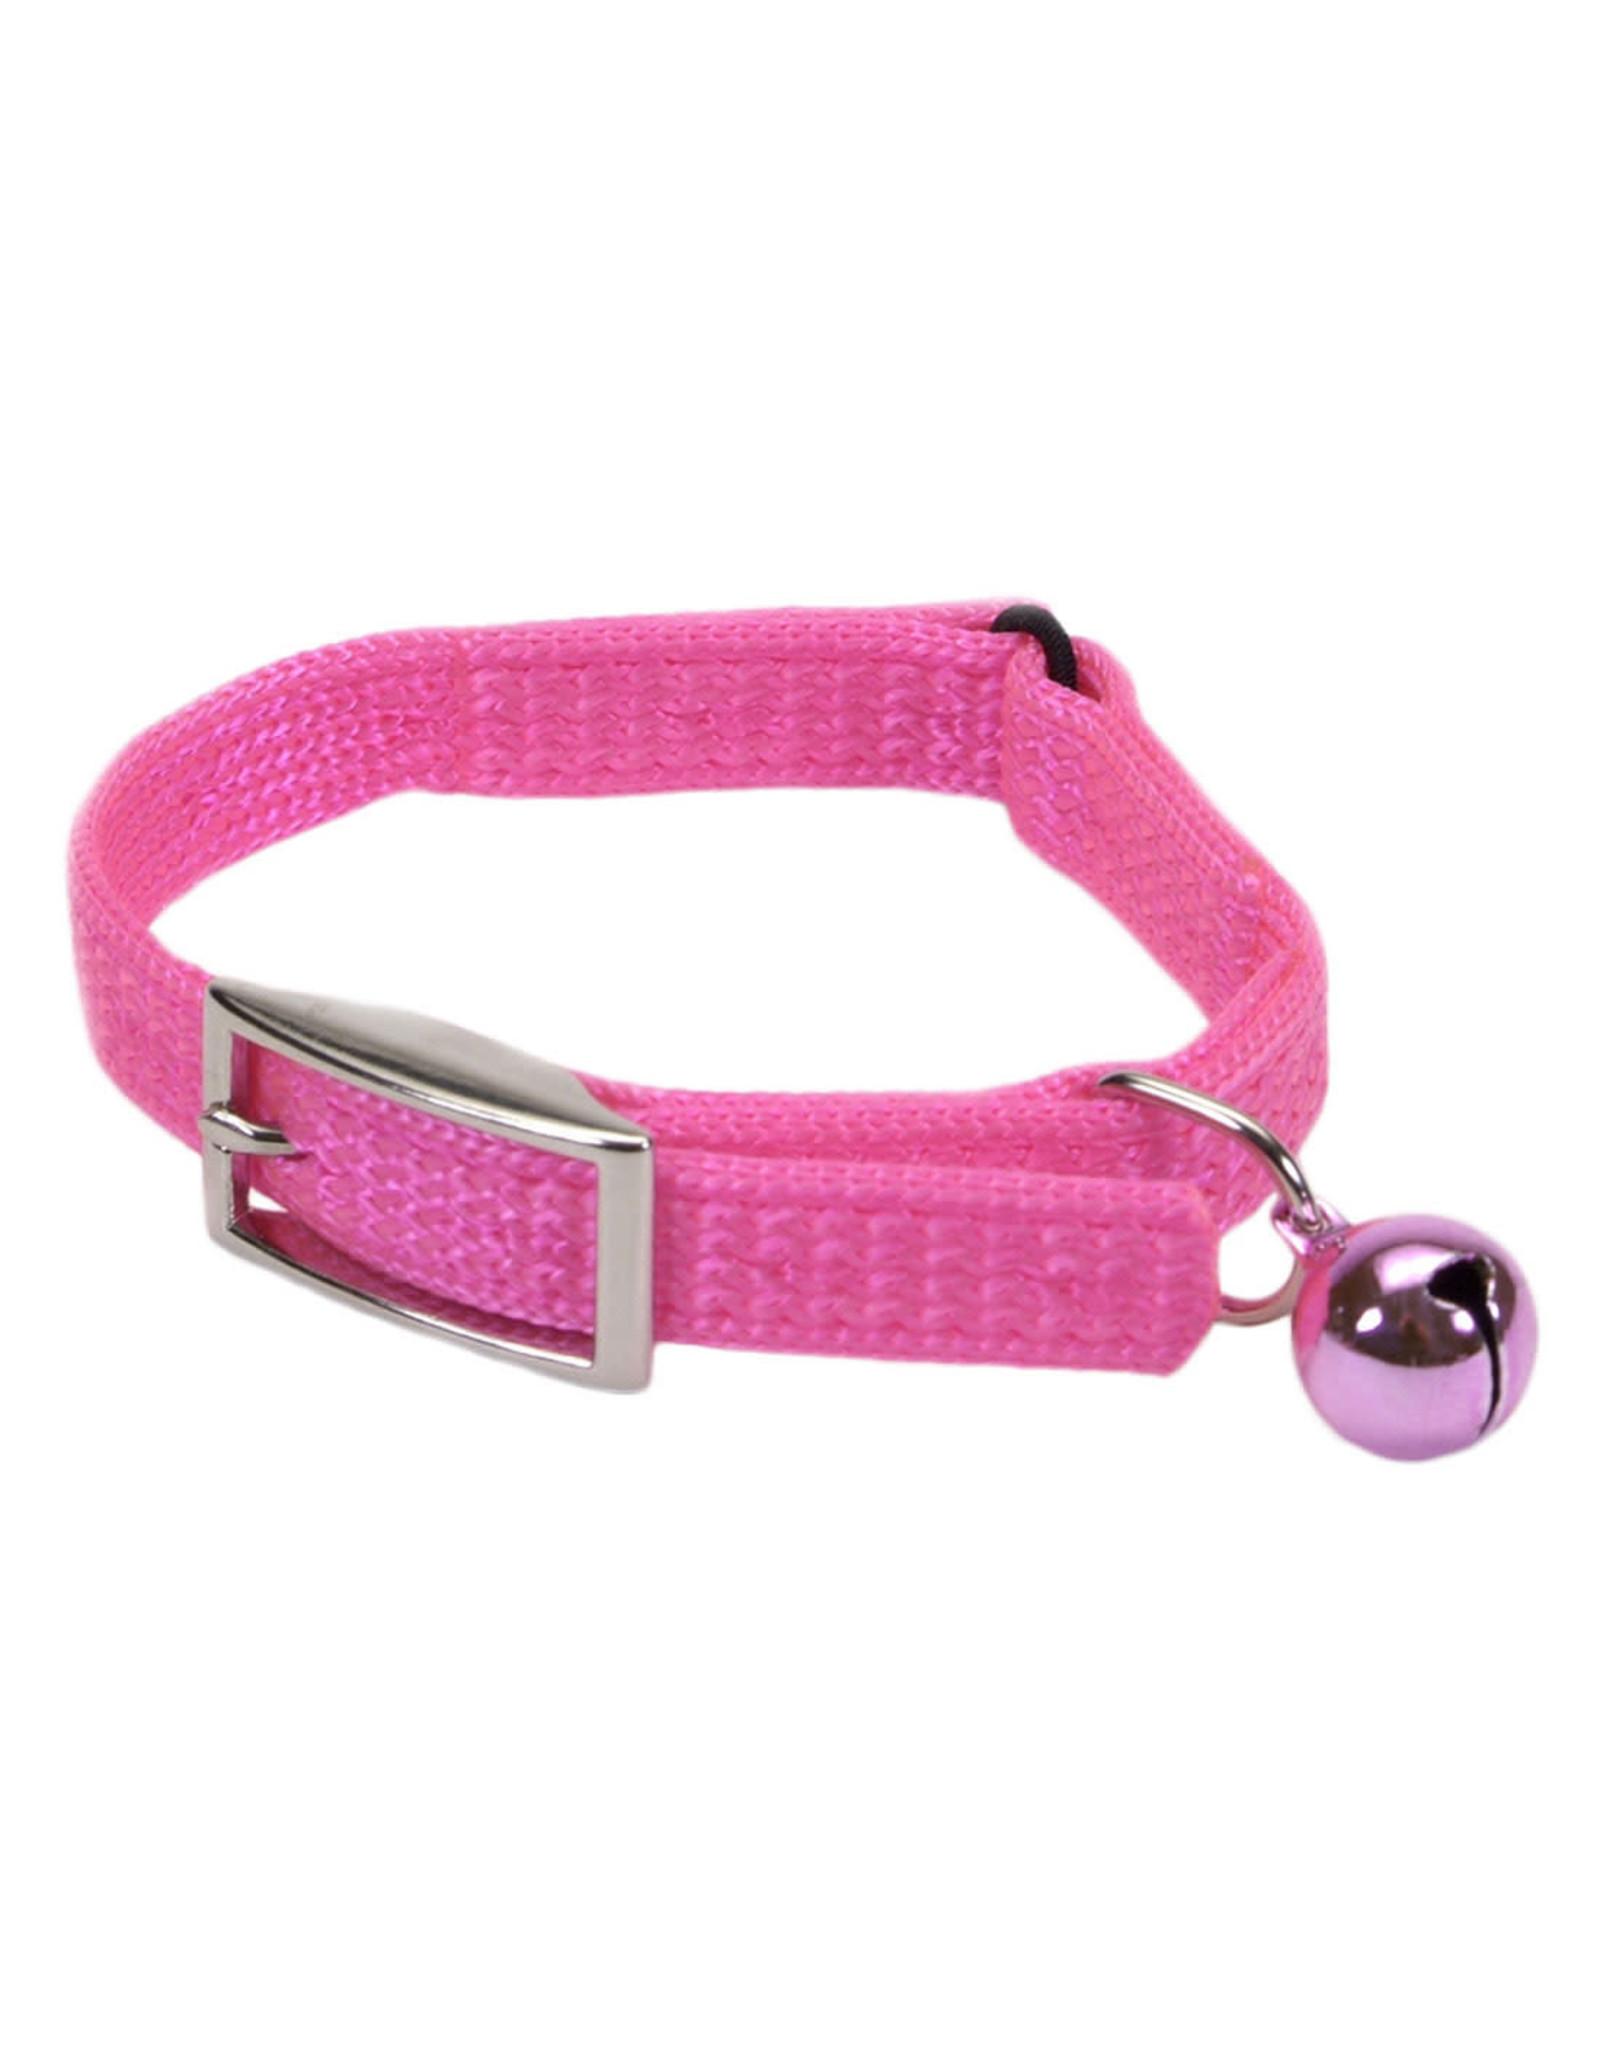 "Coastal Coastal Cat Safety Collar - 12"" Bright Pink"